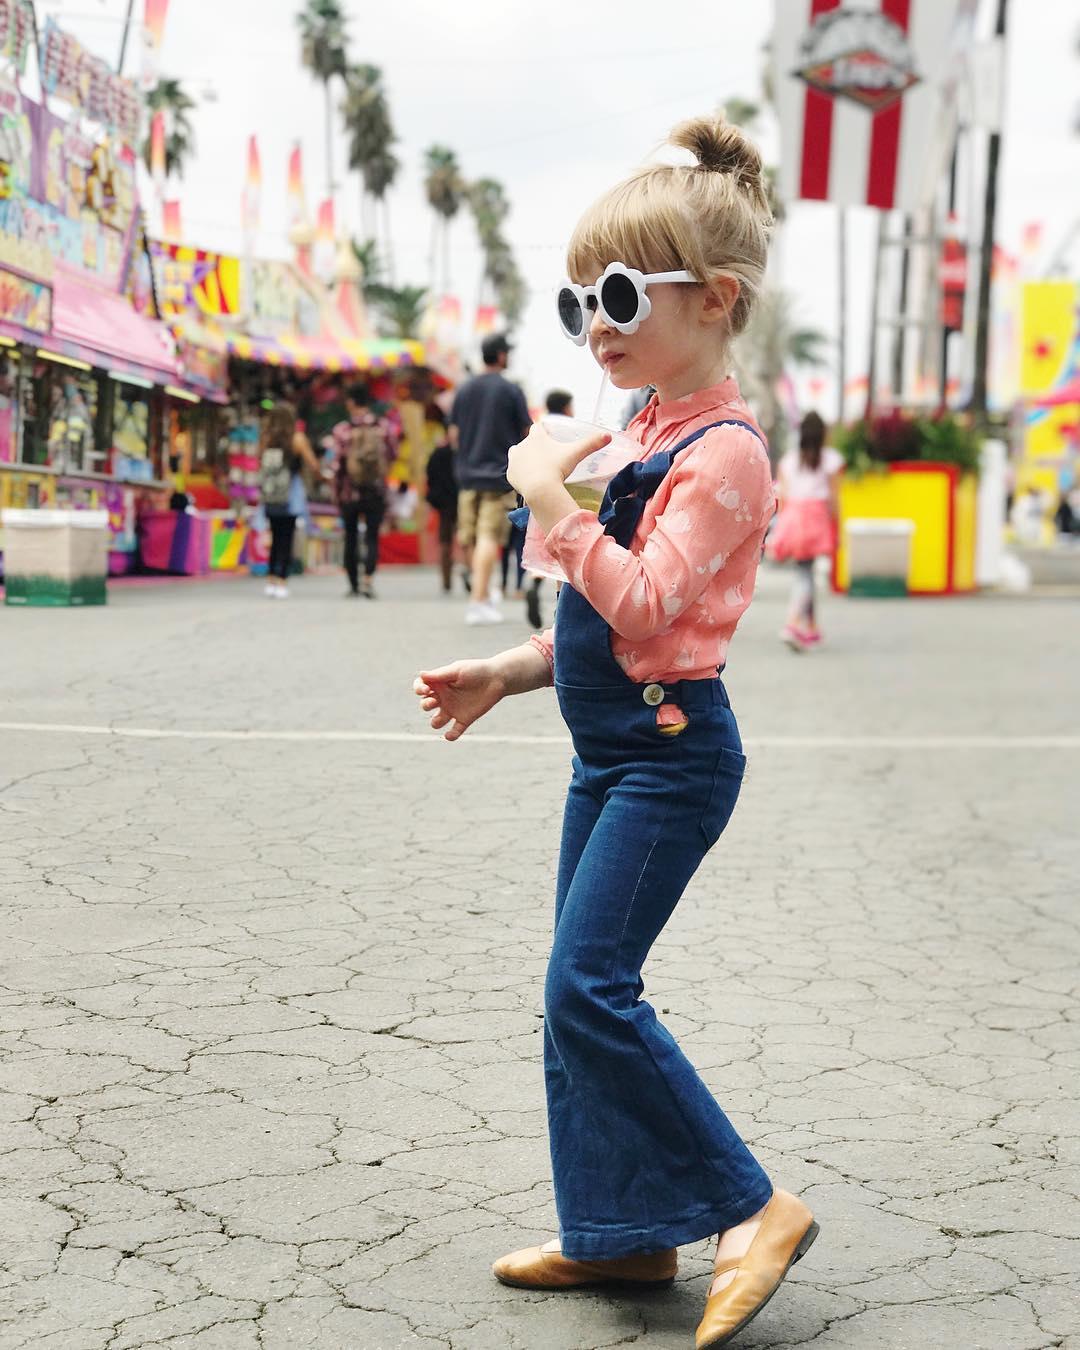 @fancytreehouse - LA County Fair